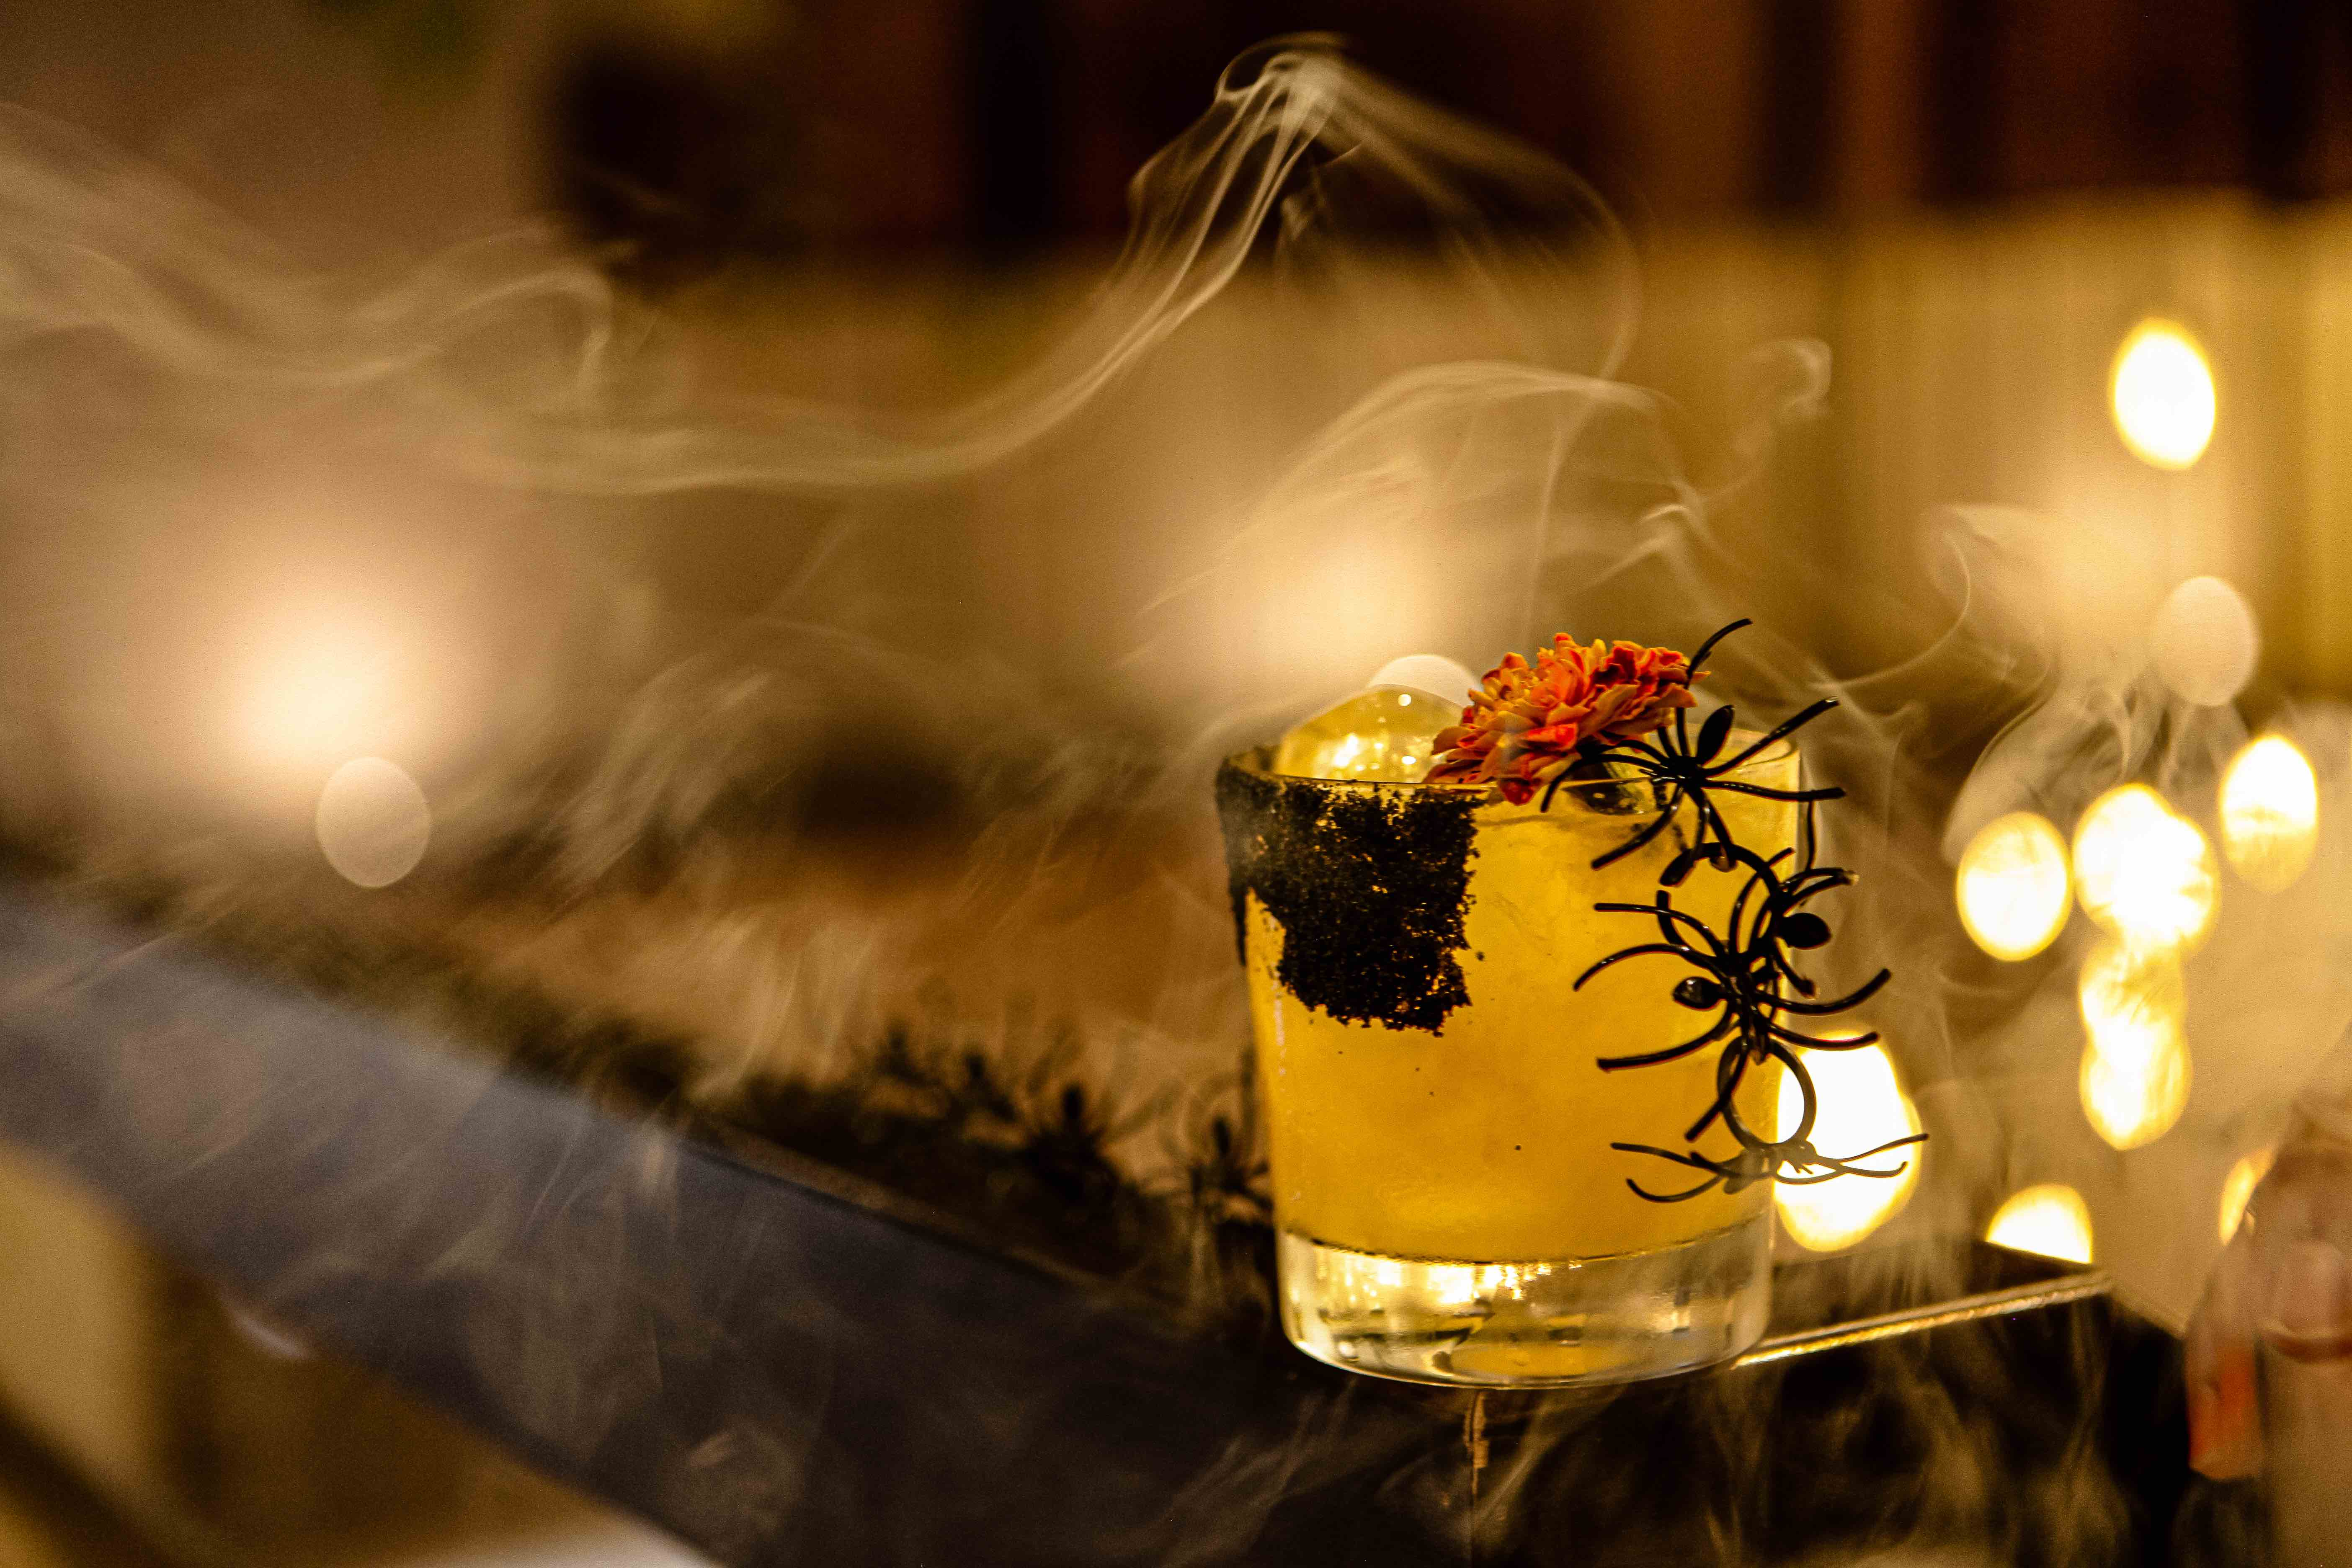 8 Drinks To Imbibe This Halloween